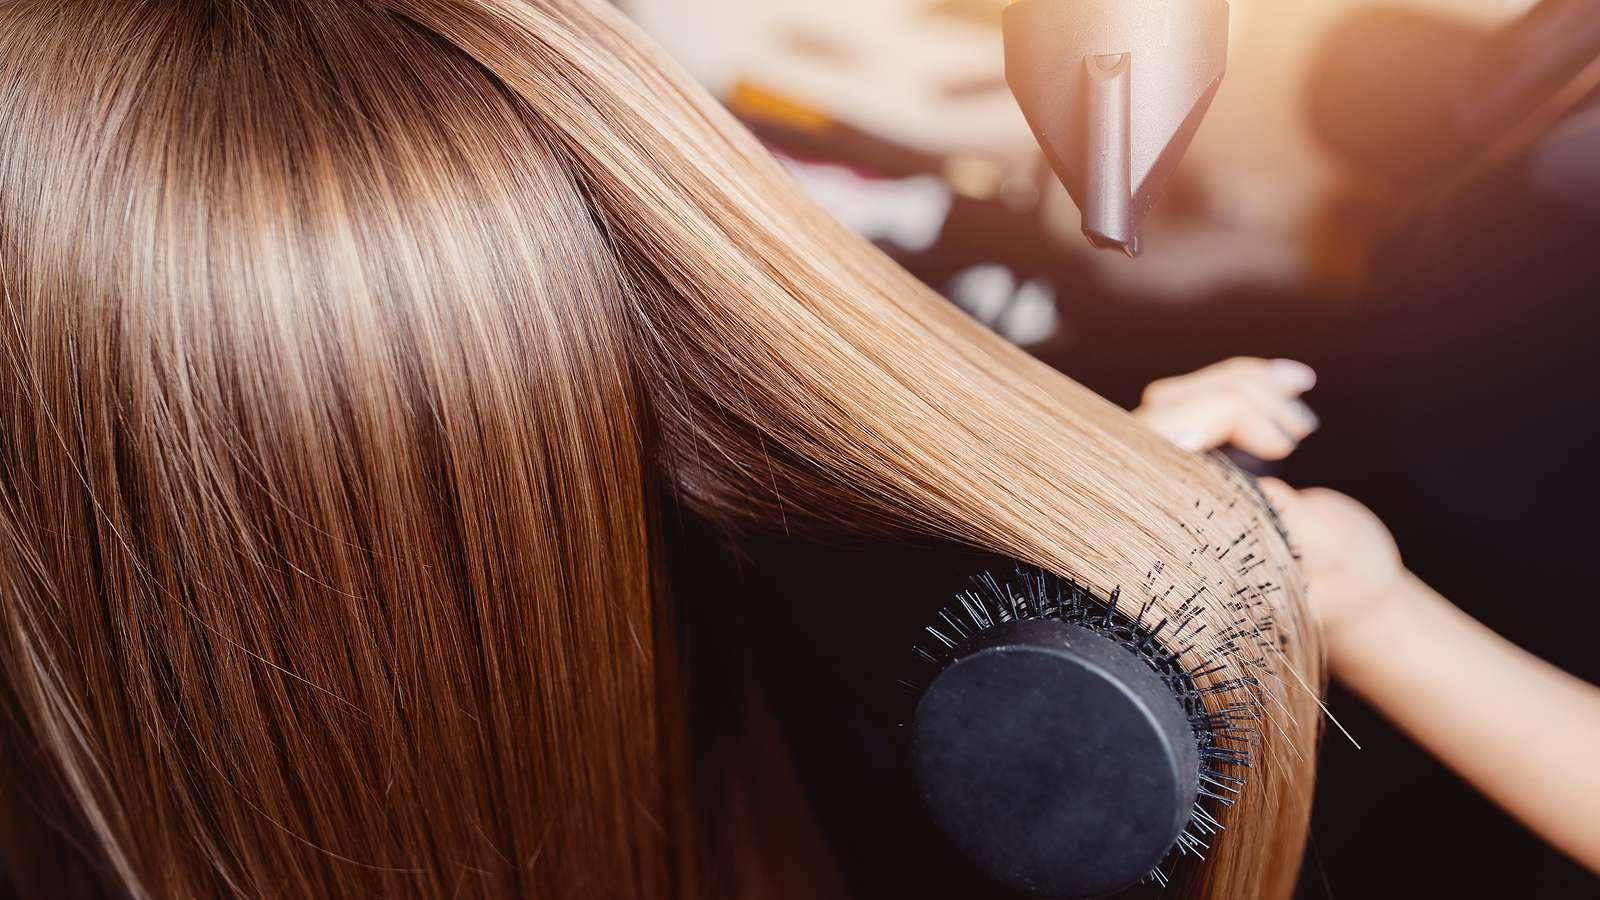 Brothers Hair Design Shreveport La Cuts Color Brazilian Blowout